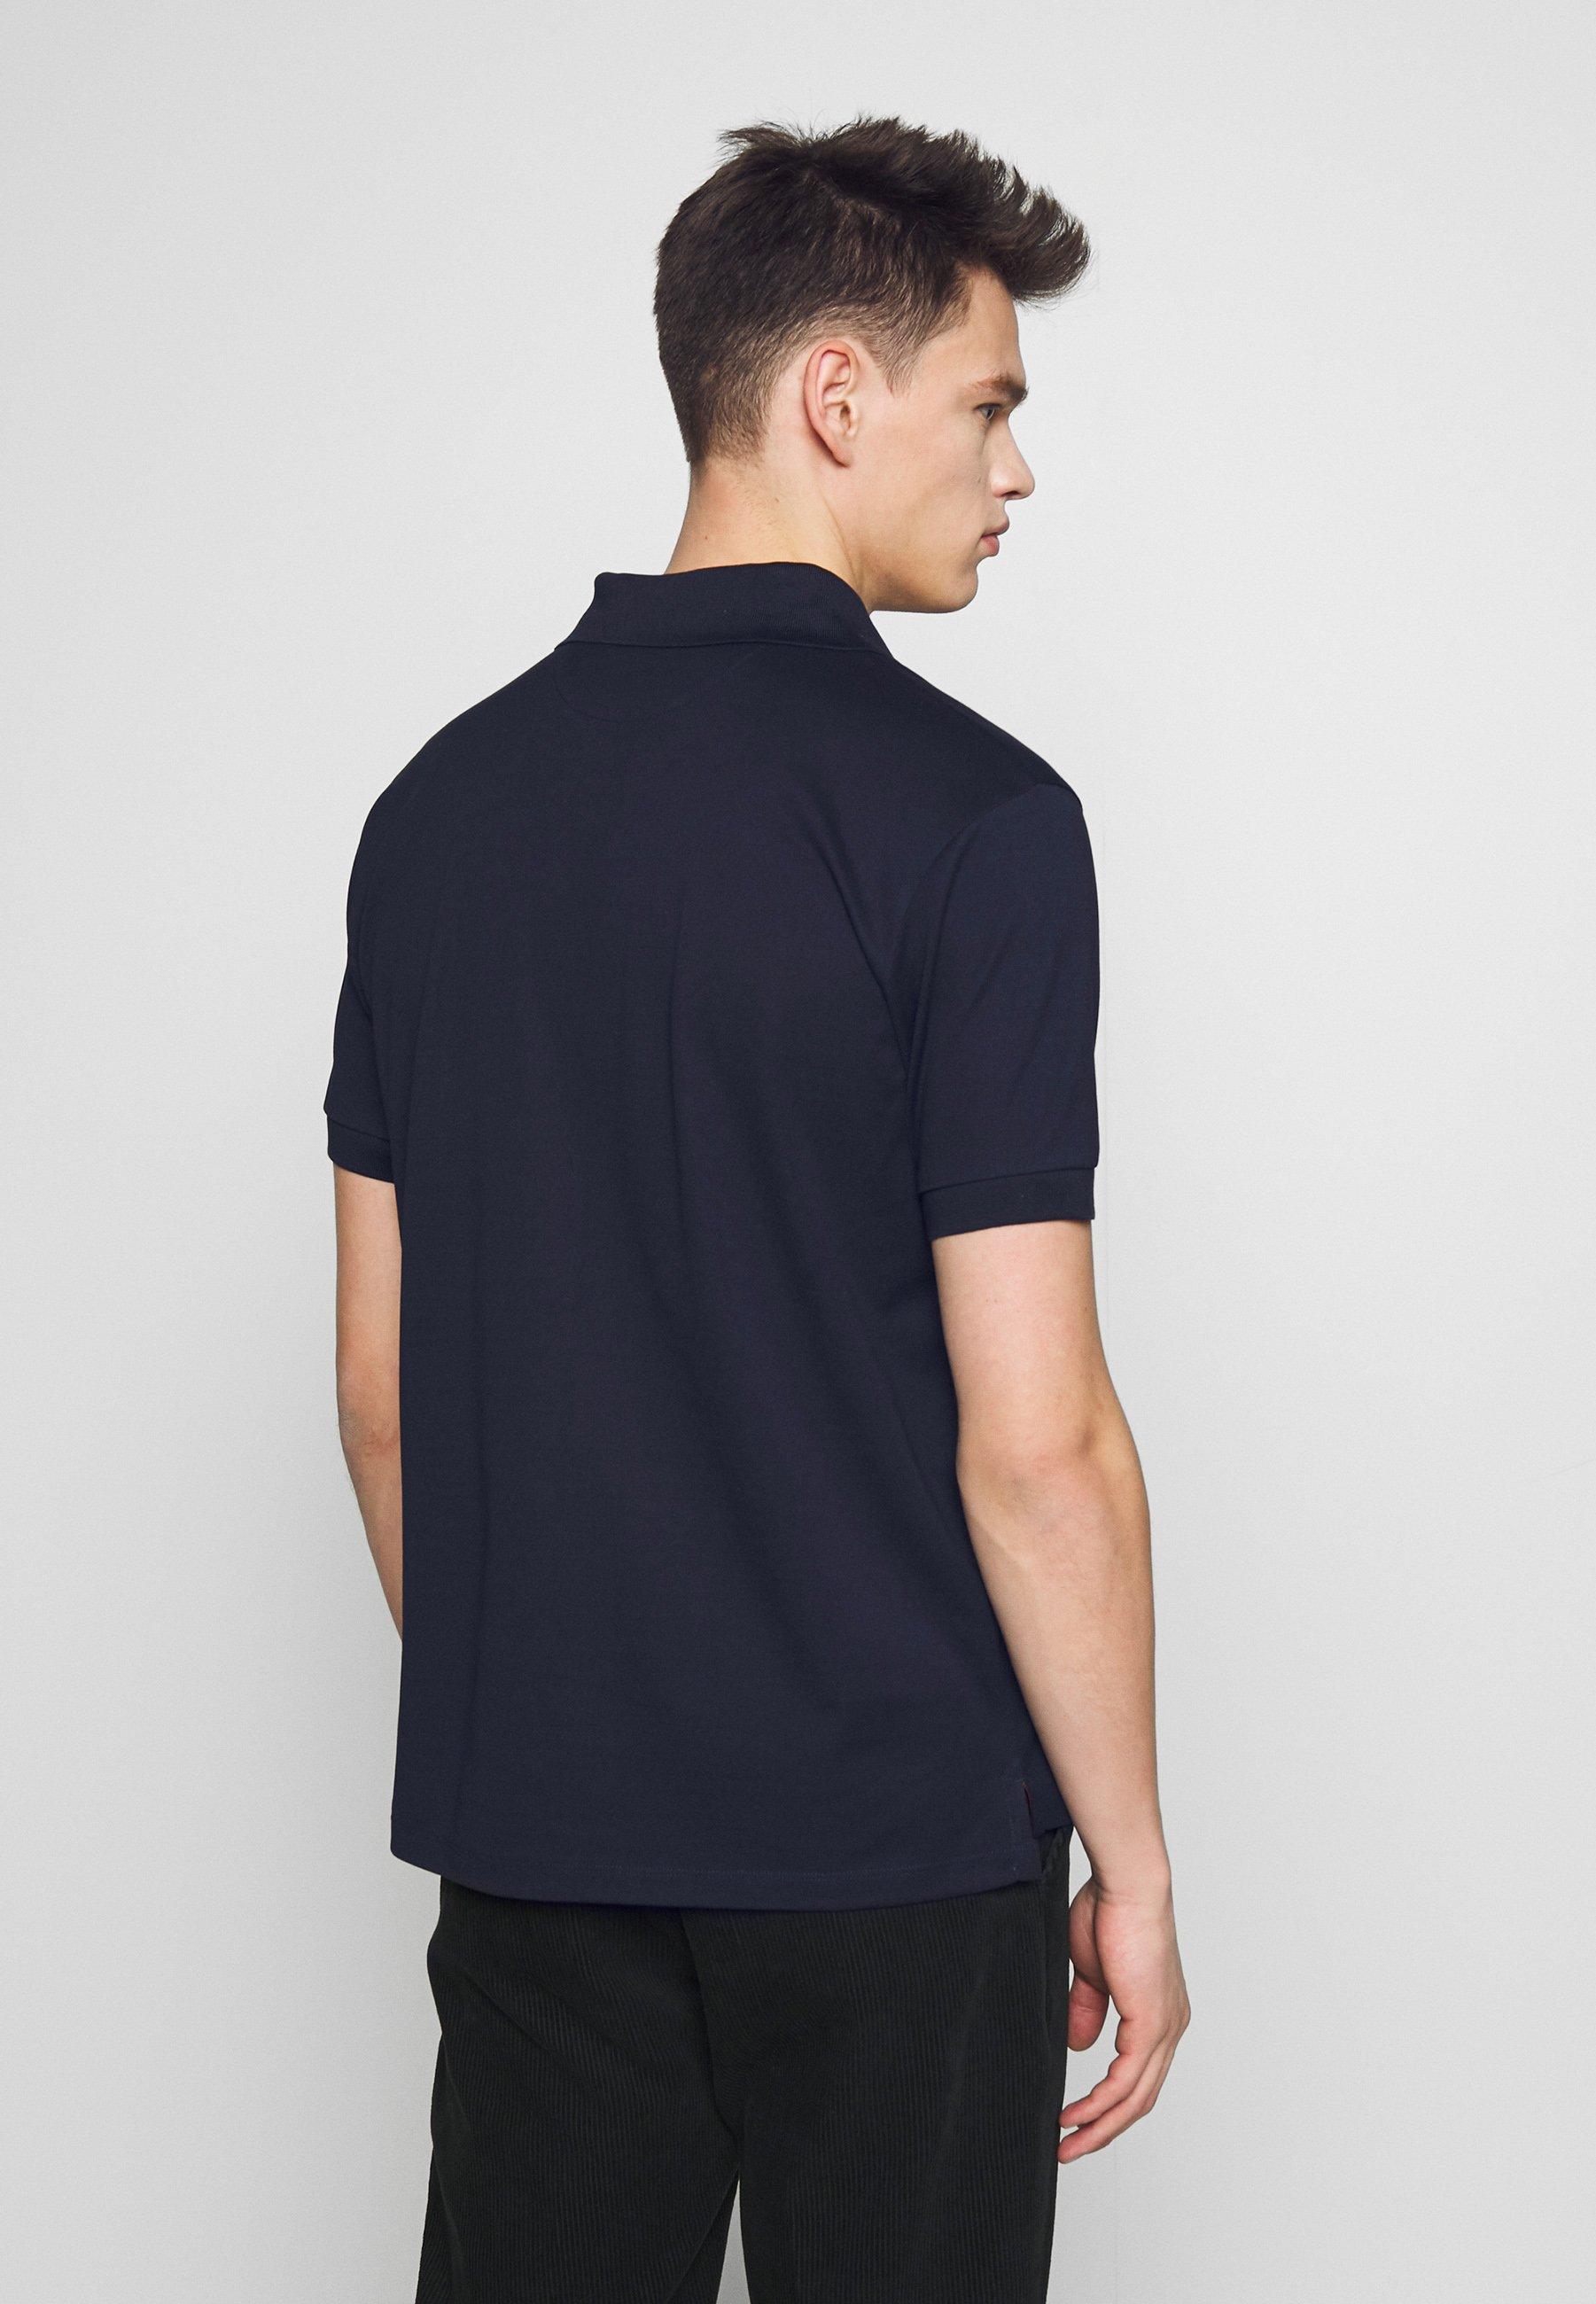 Paul Smith GENTS POLO - Polo shirt - dark blue AWqkp